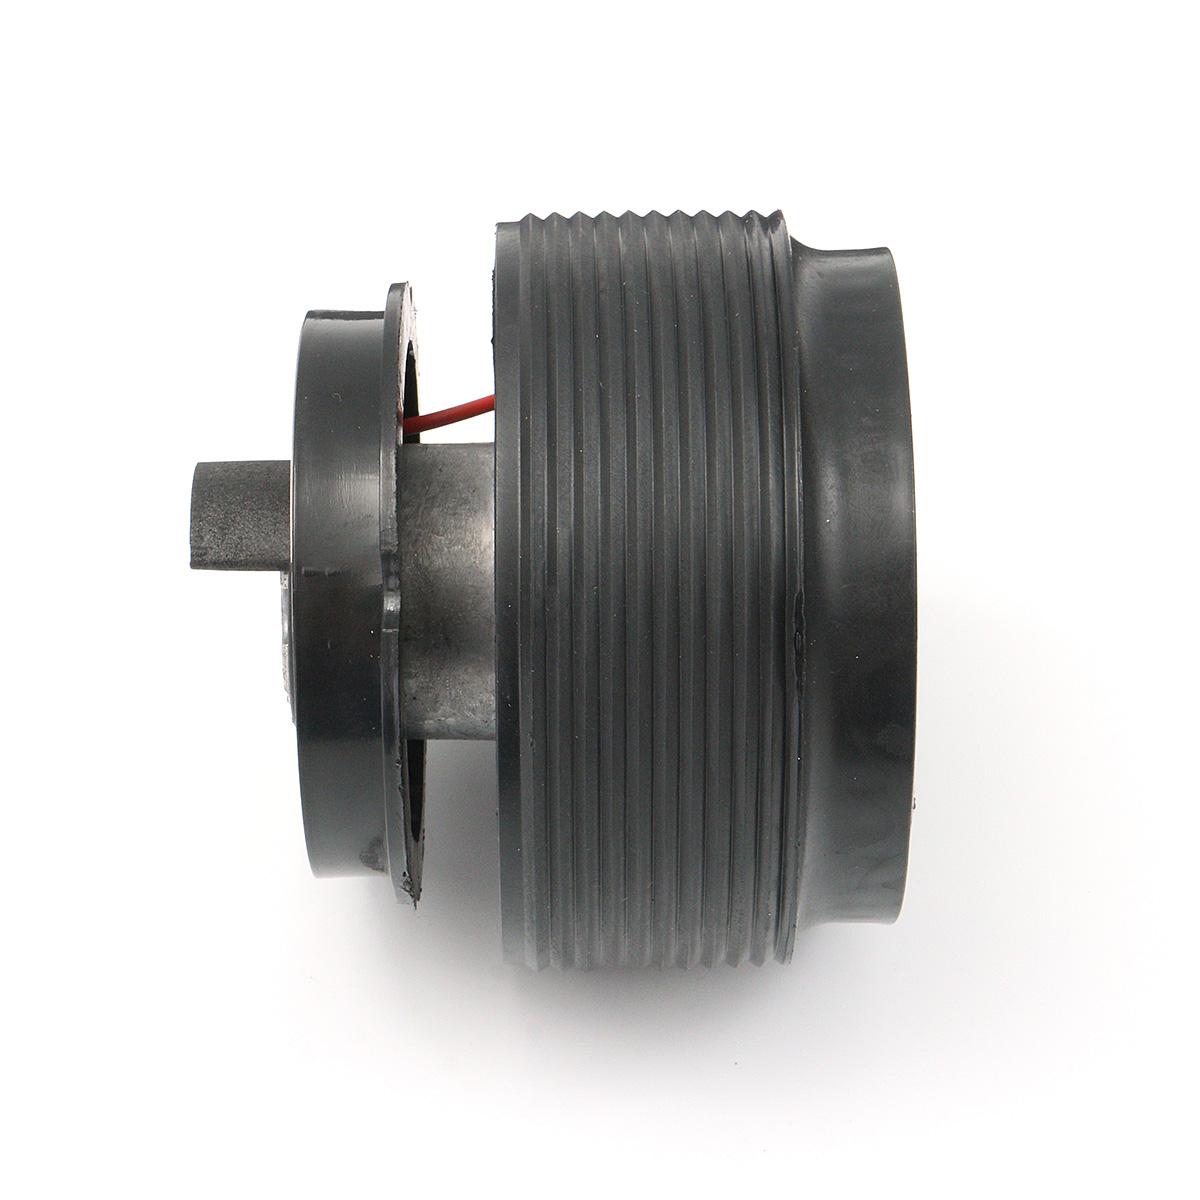 Steering Wheel Boss Kit Hub Quick Release Adapter For CORSA ASTRA CALIBRA